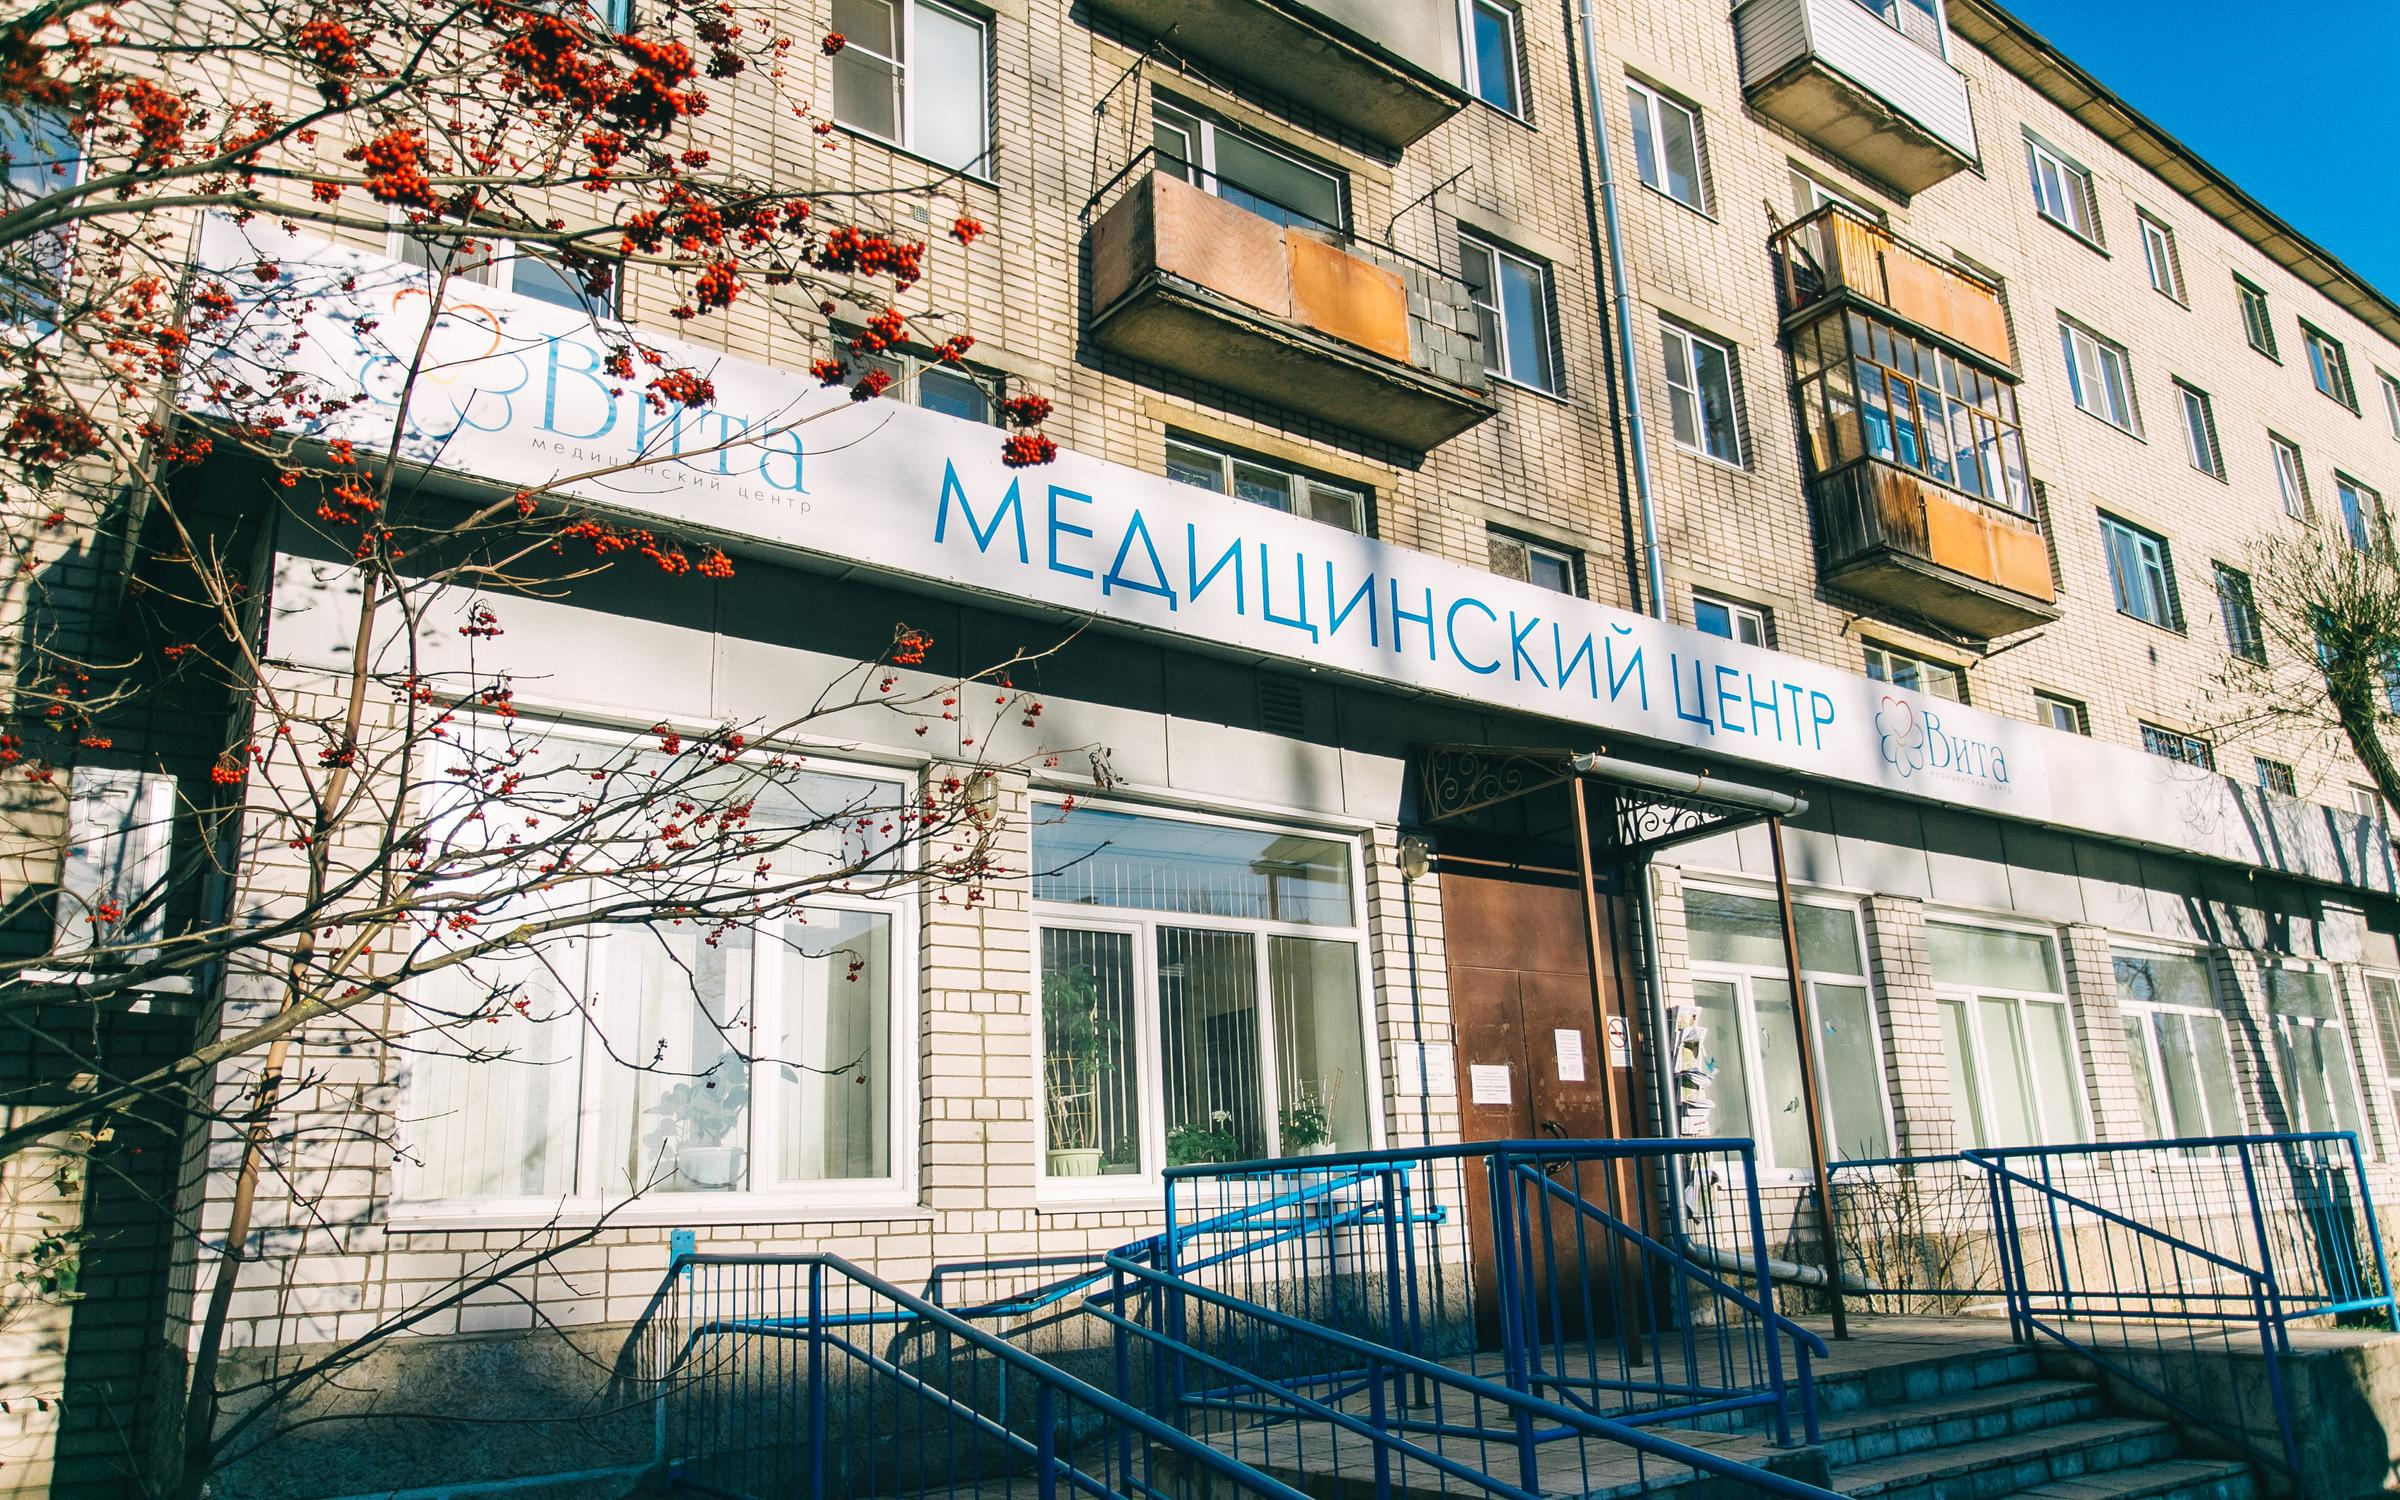 фотография Медицинского центра Вита на улице Беляева